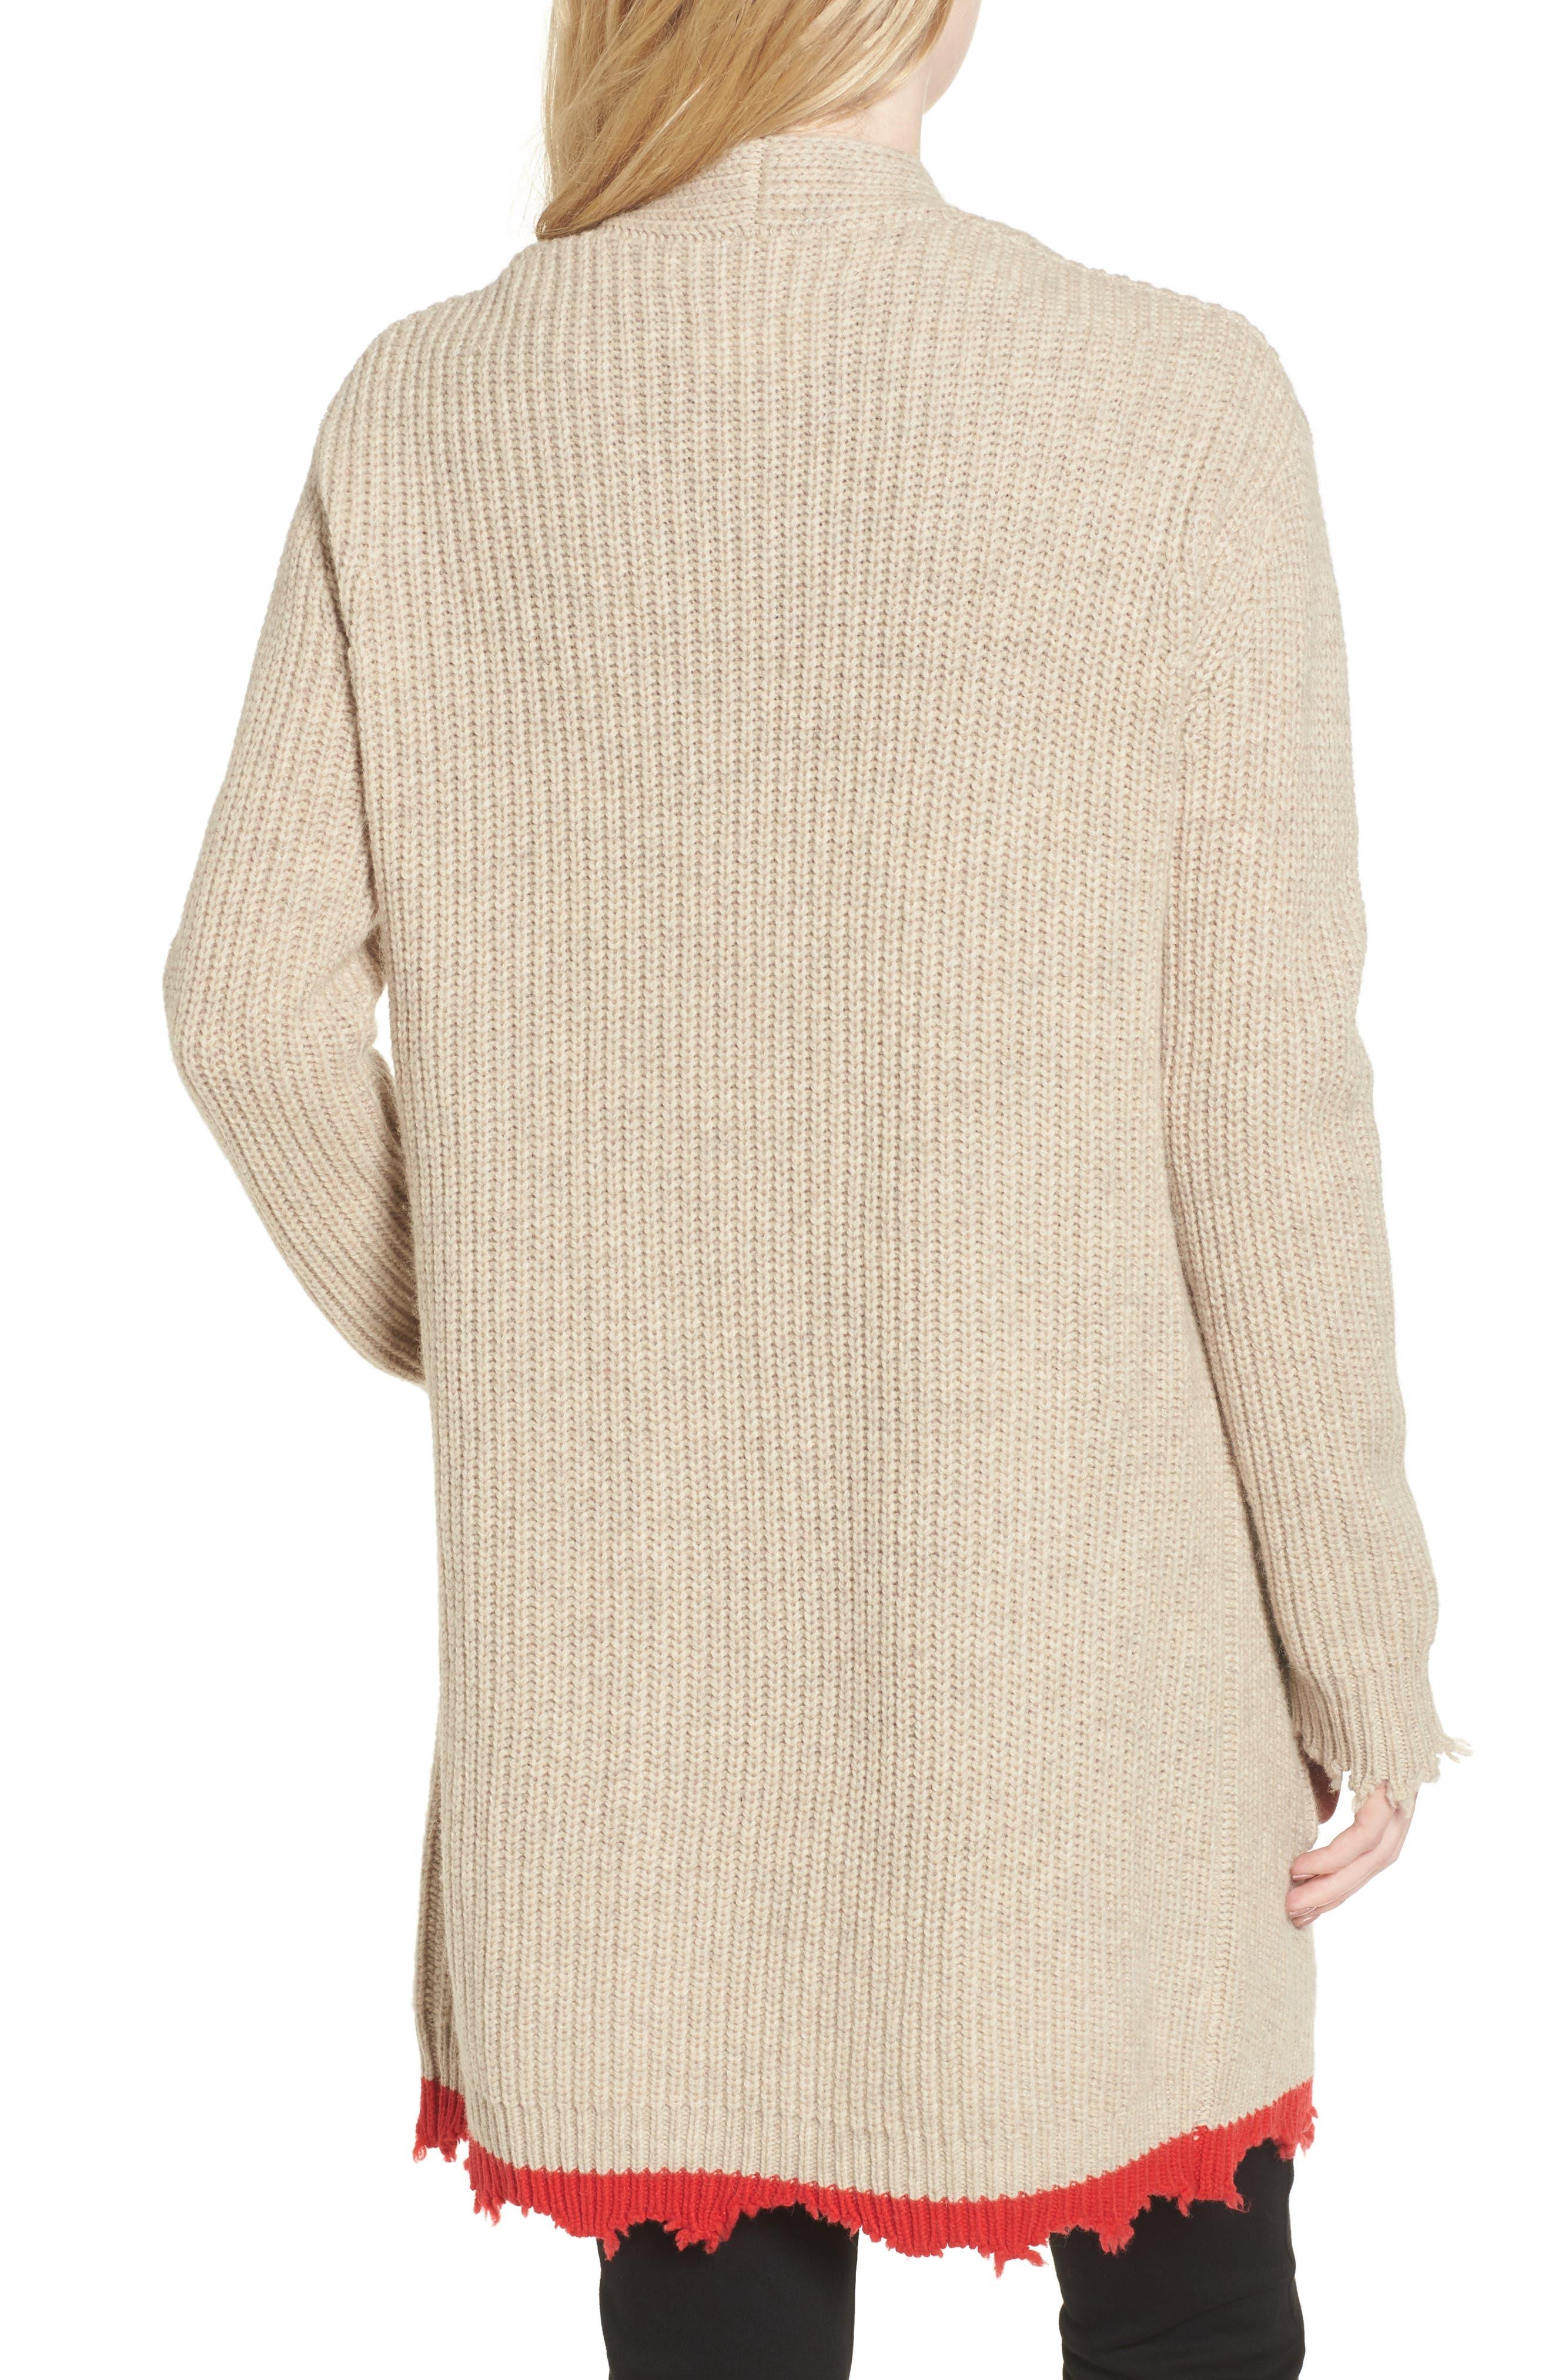 Rita Cardigan Sweater,                             Alternate thumbnail 2, color,